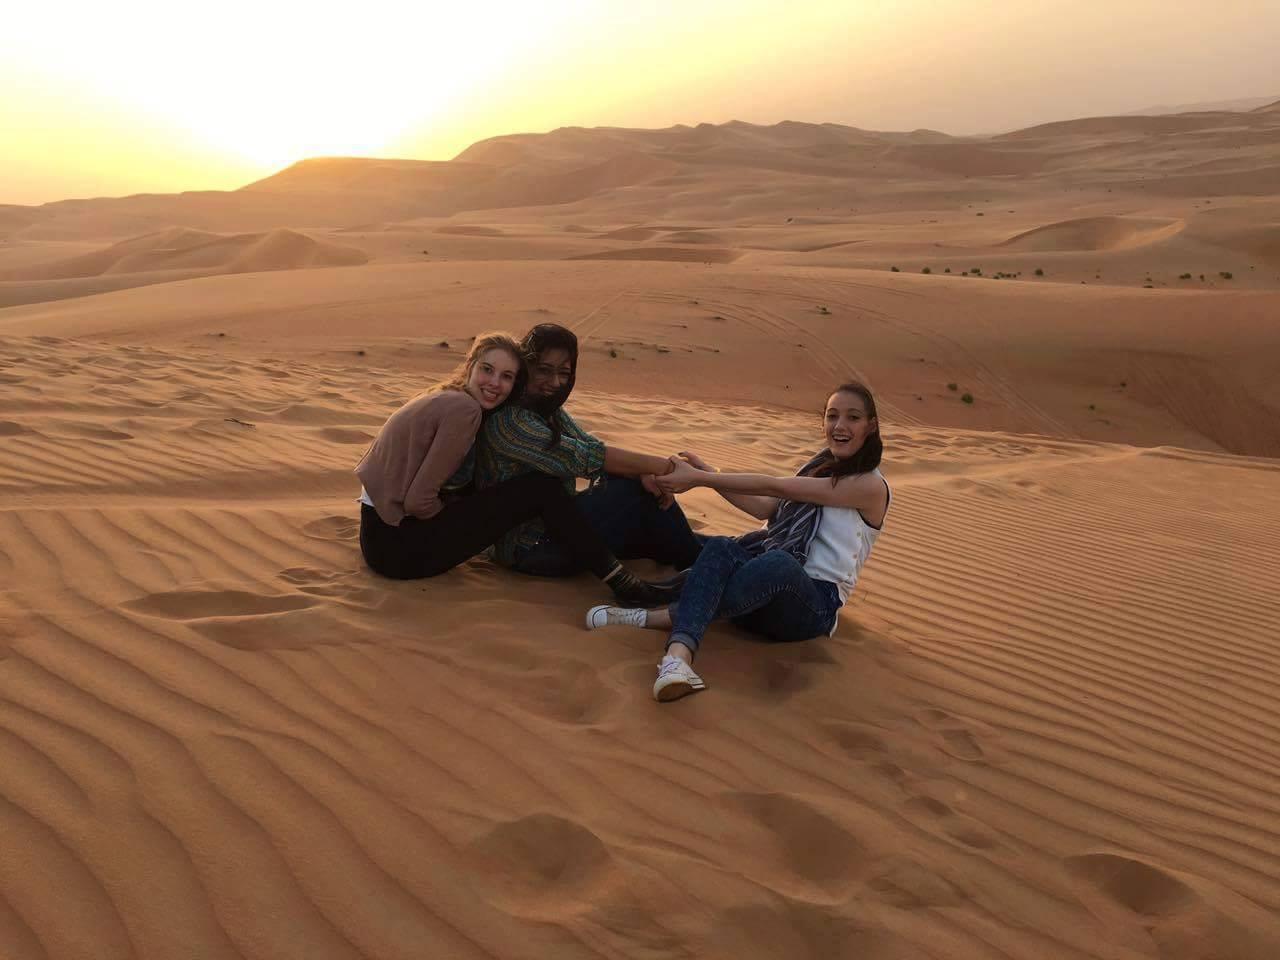 Noli desert